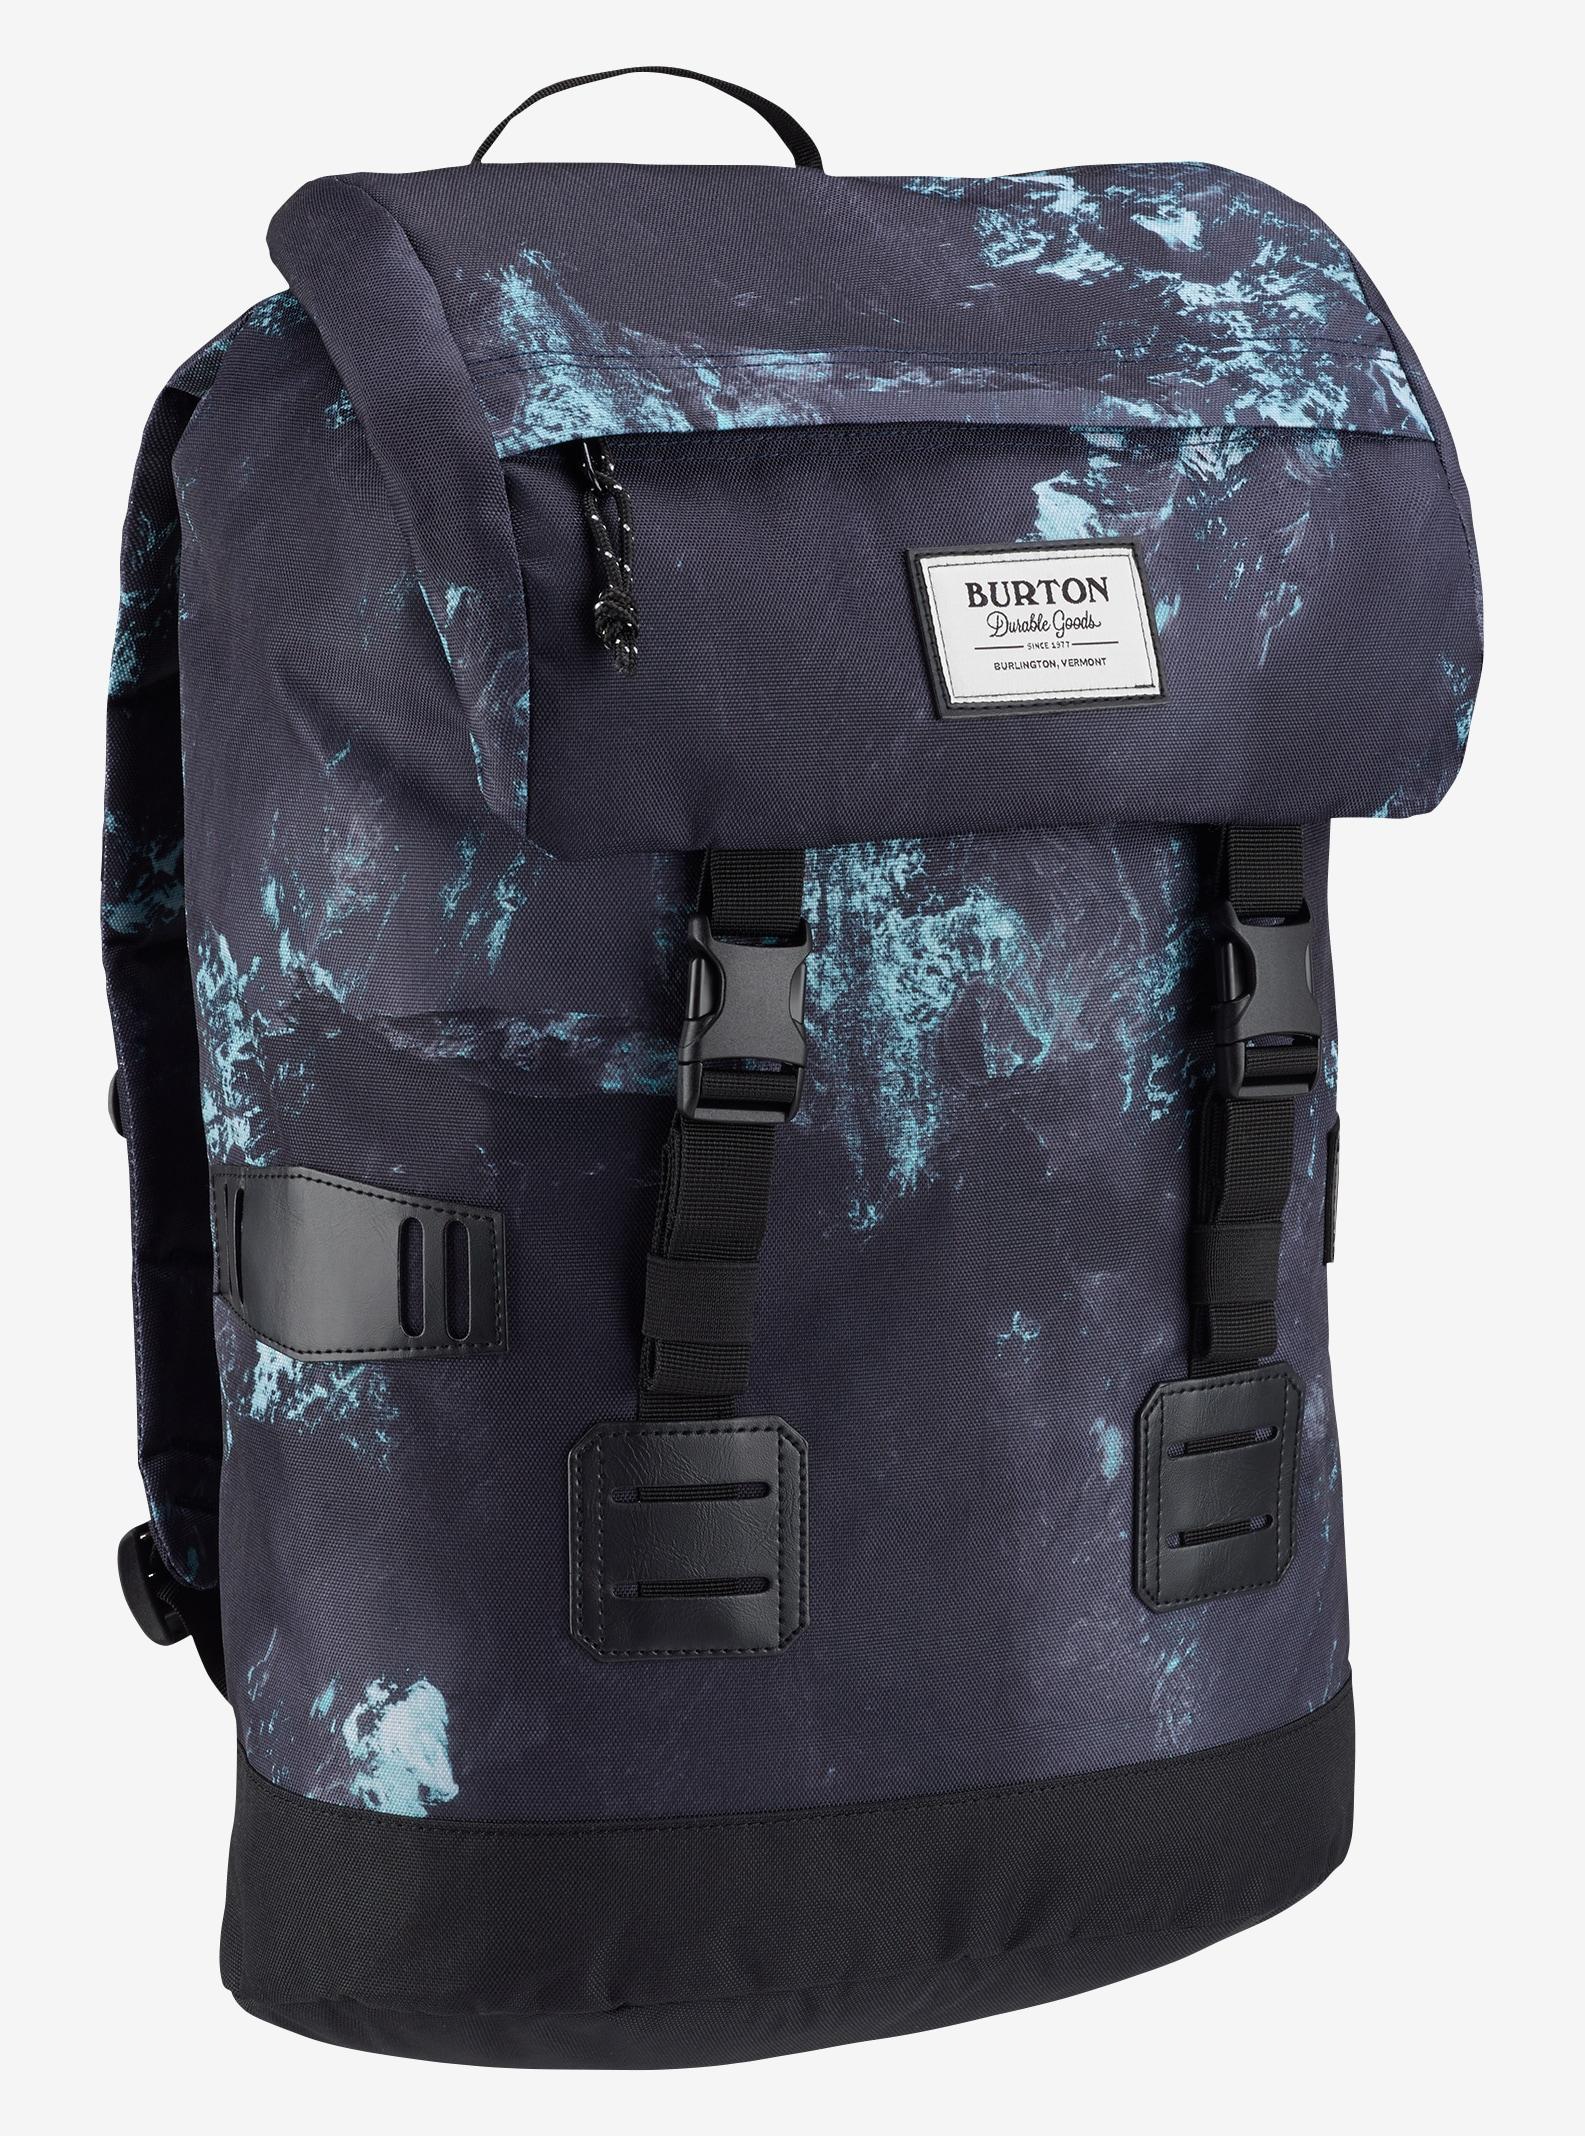 Burton Tinder Backpack shown in Nix Olympica Print